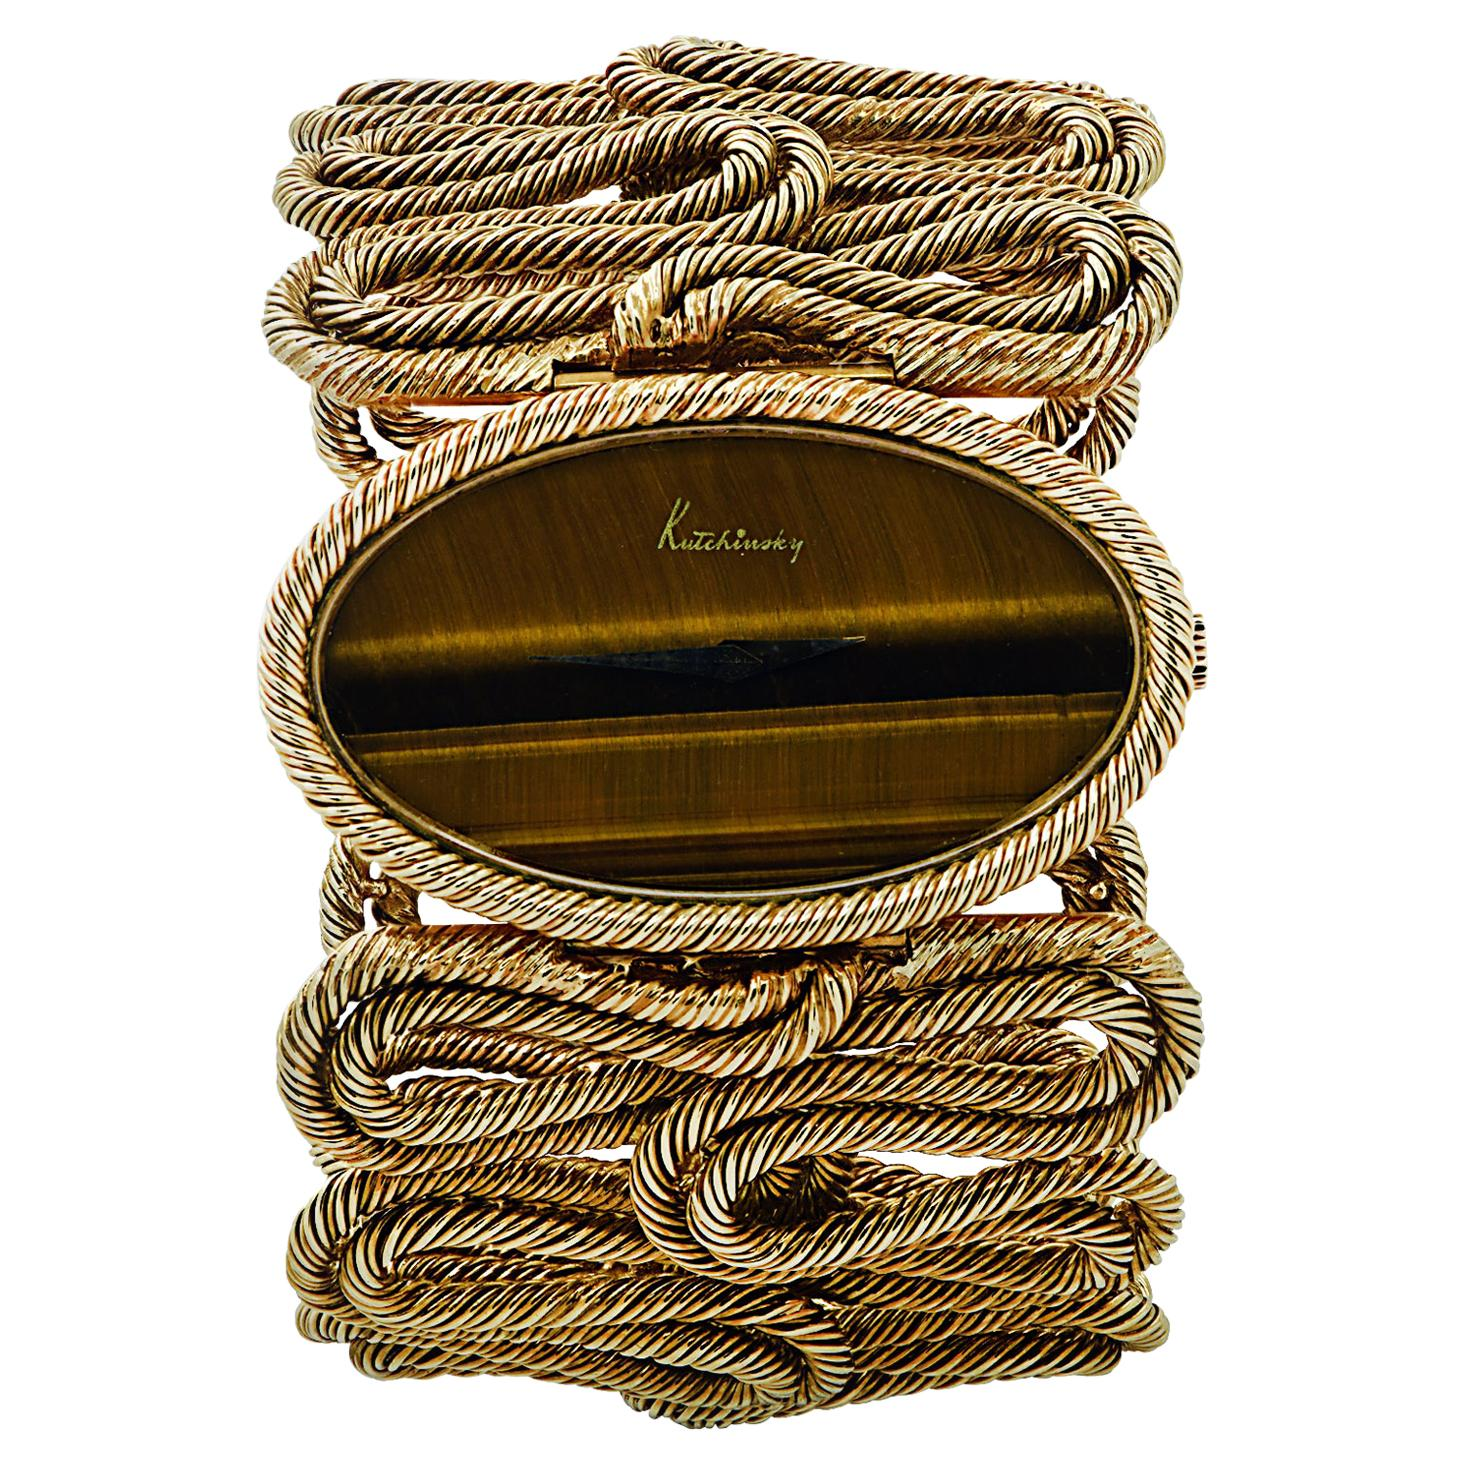 Circa 1970 Kutchinsky Yellow Gold Tiger's Eye Cuff Watch